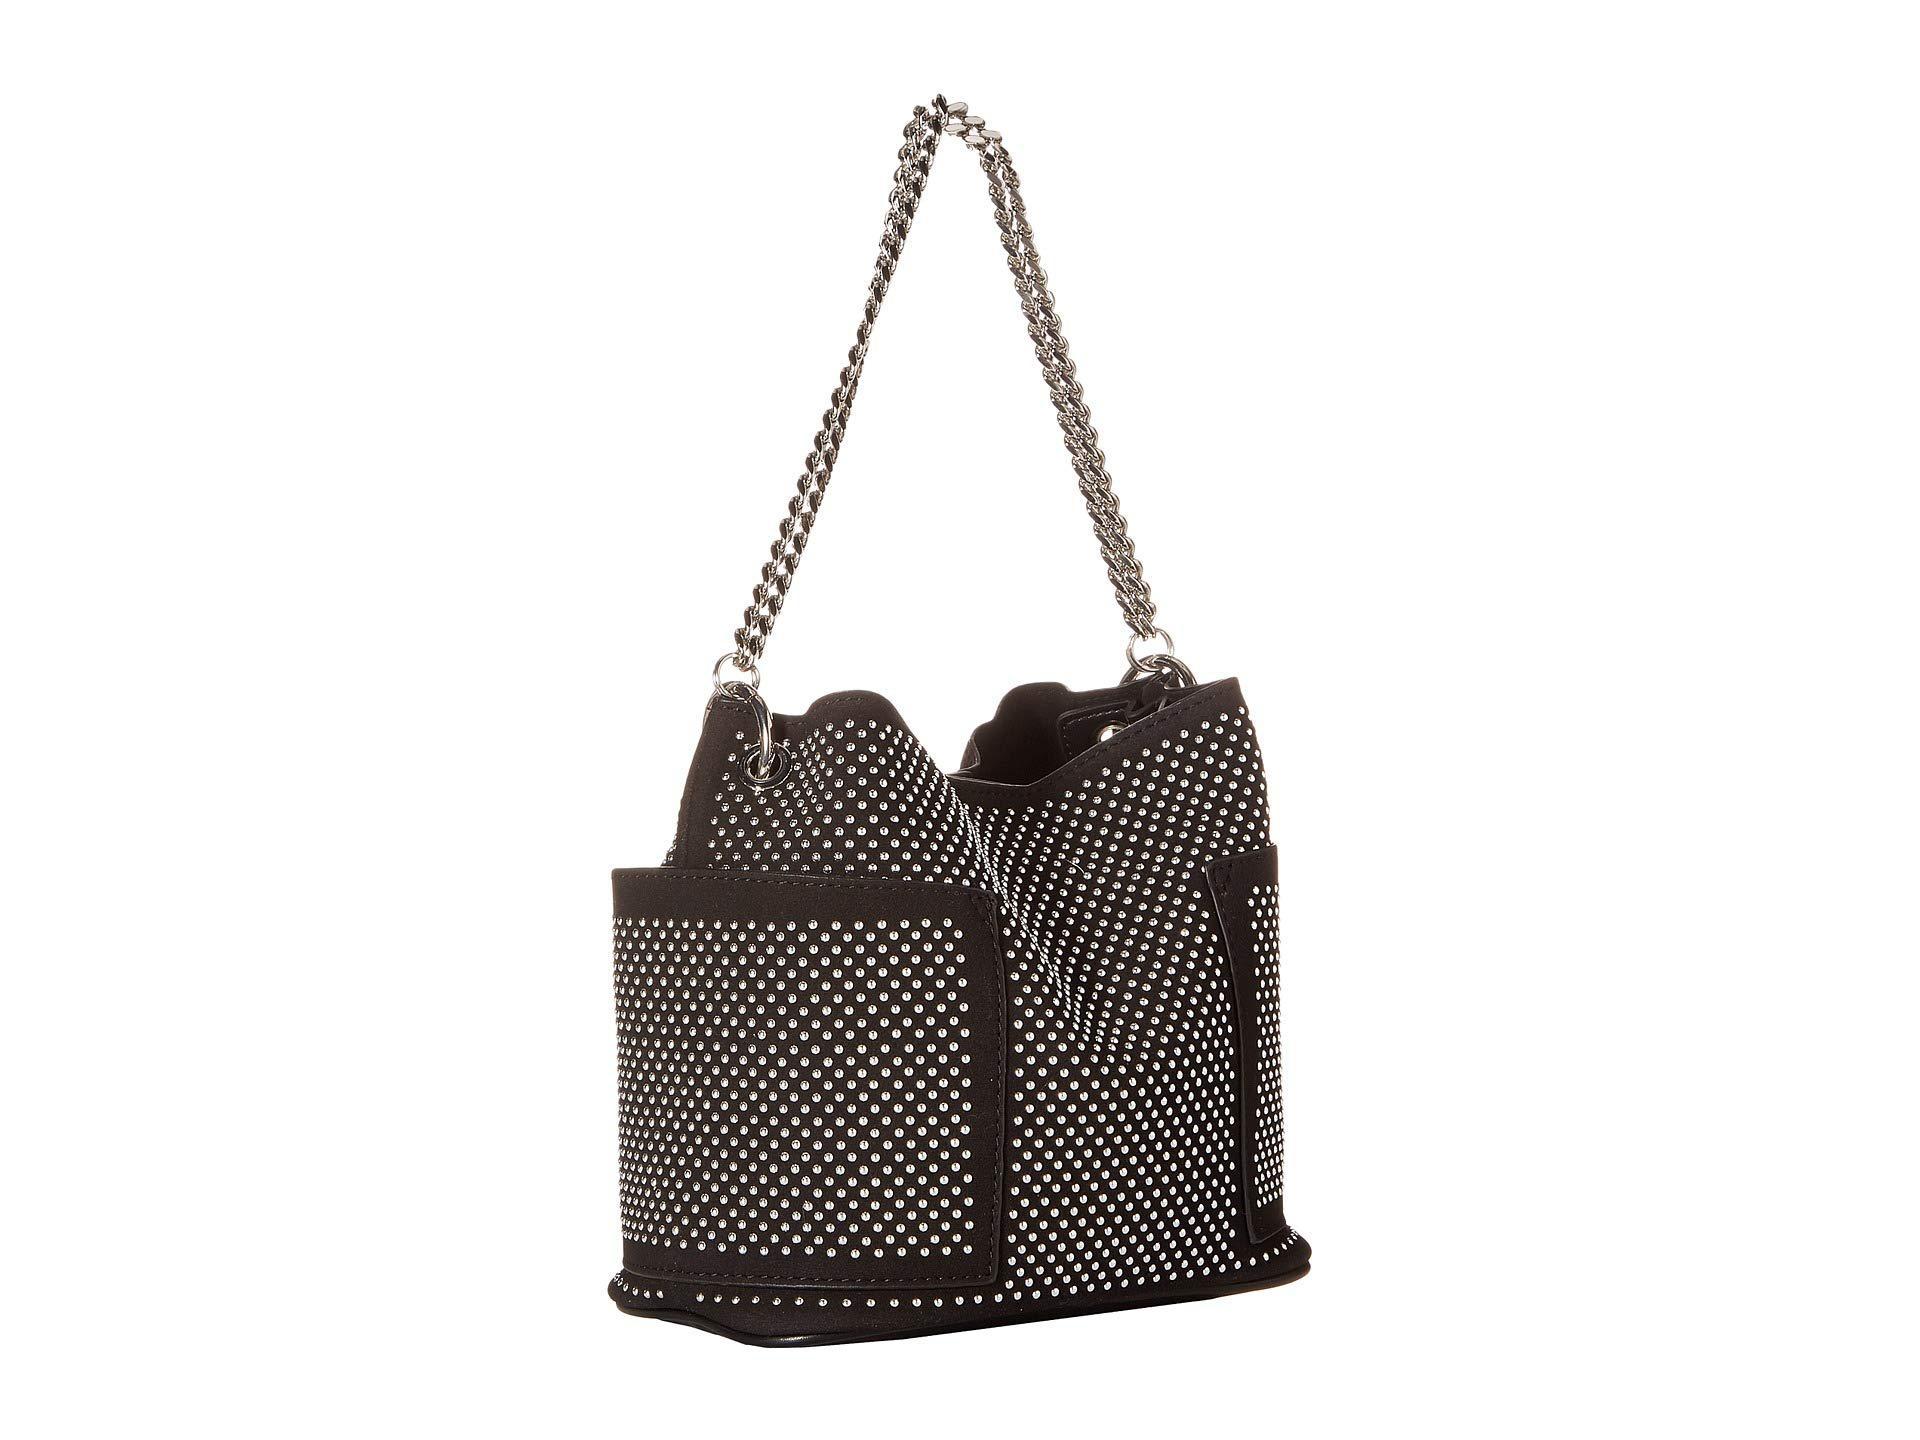 32dfa25329 Steve Madden - Bsasha (black) Hobo Handbags - Lyst. View fullscreen